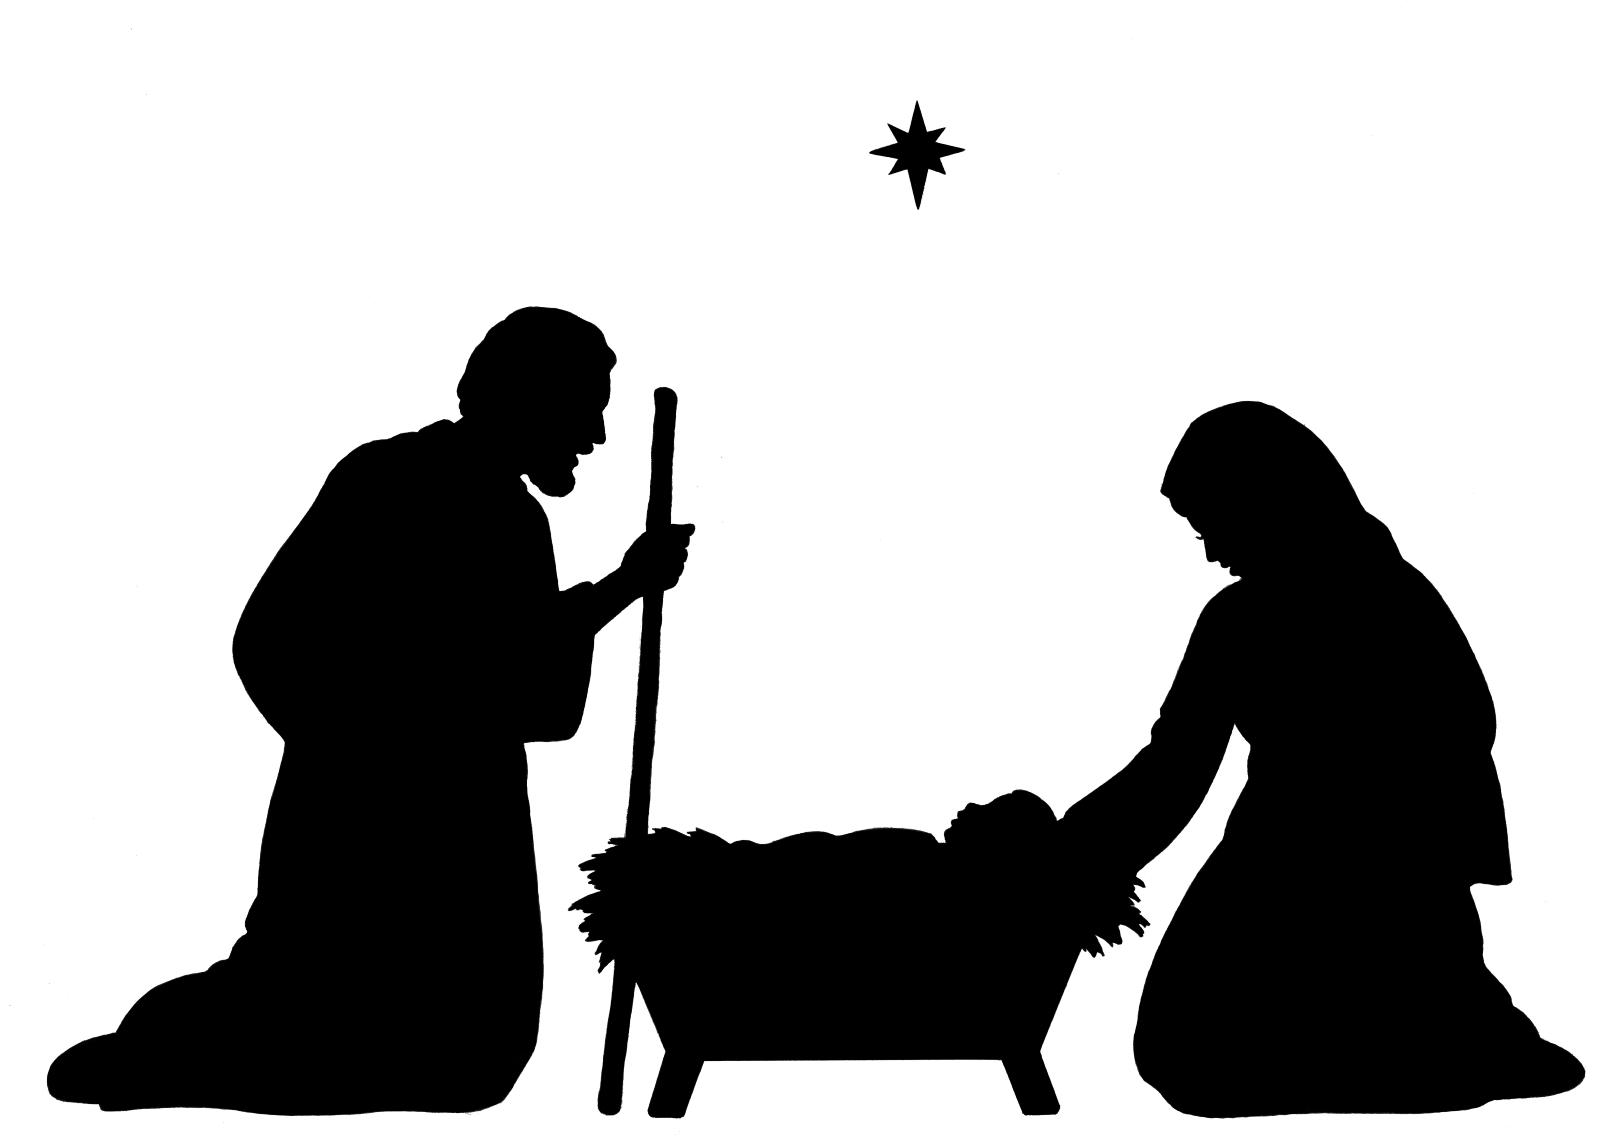 1600x1148 Nativity Silhouette Free Nativity Silhouette Clipart 3